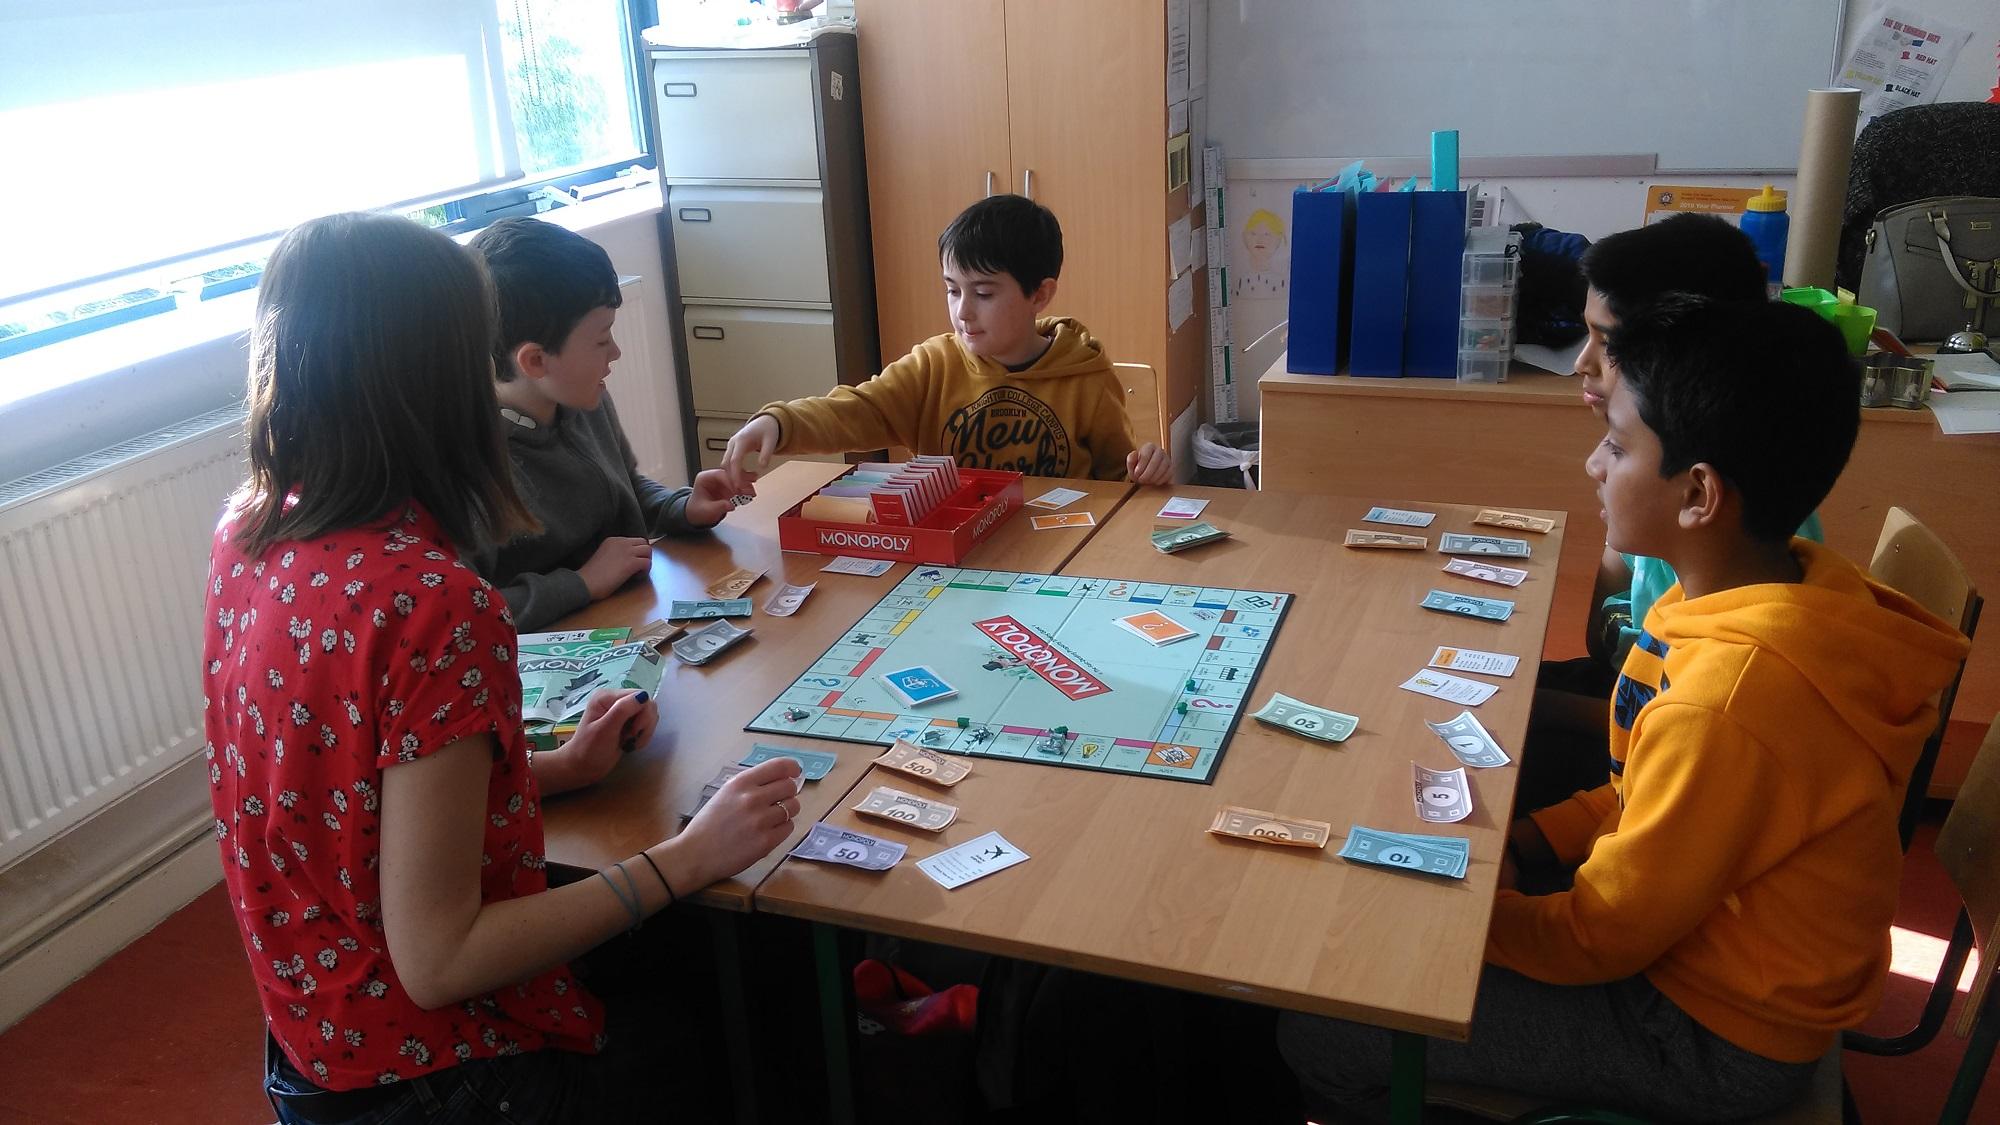 greece monopoly